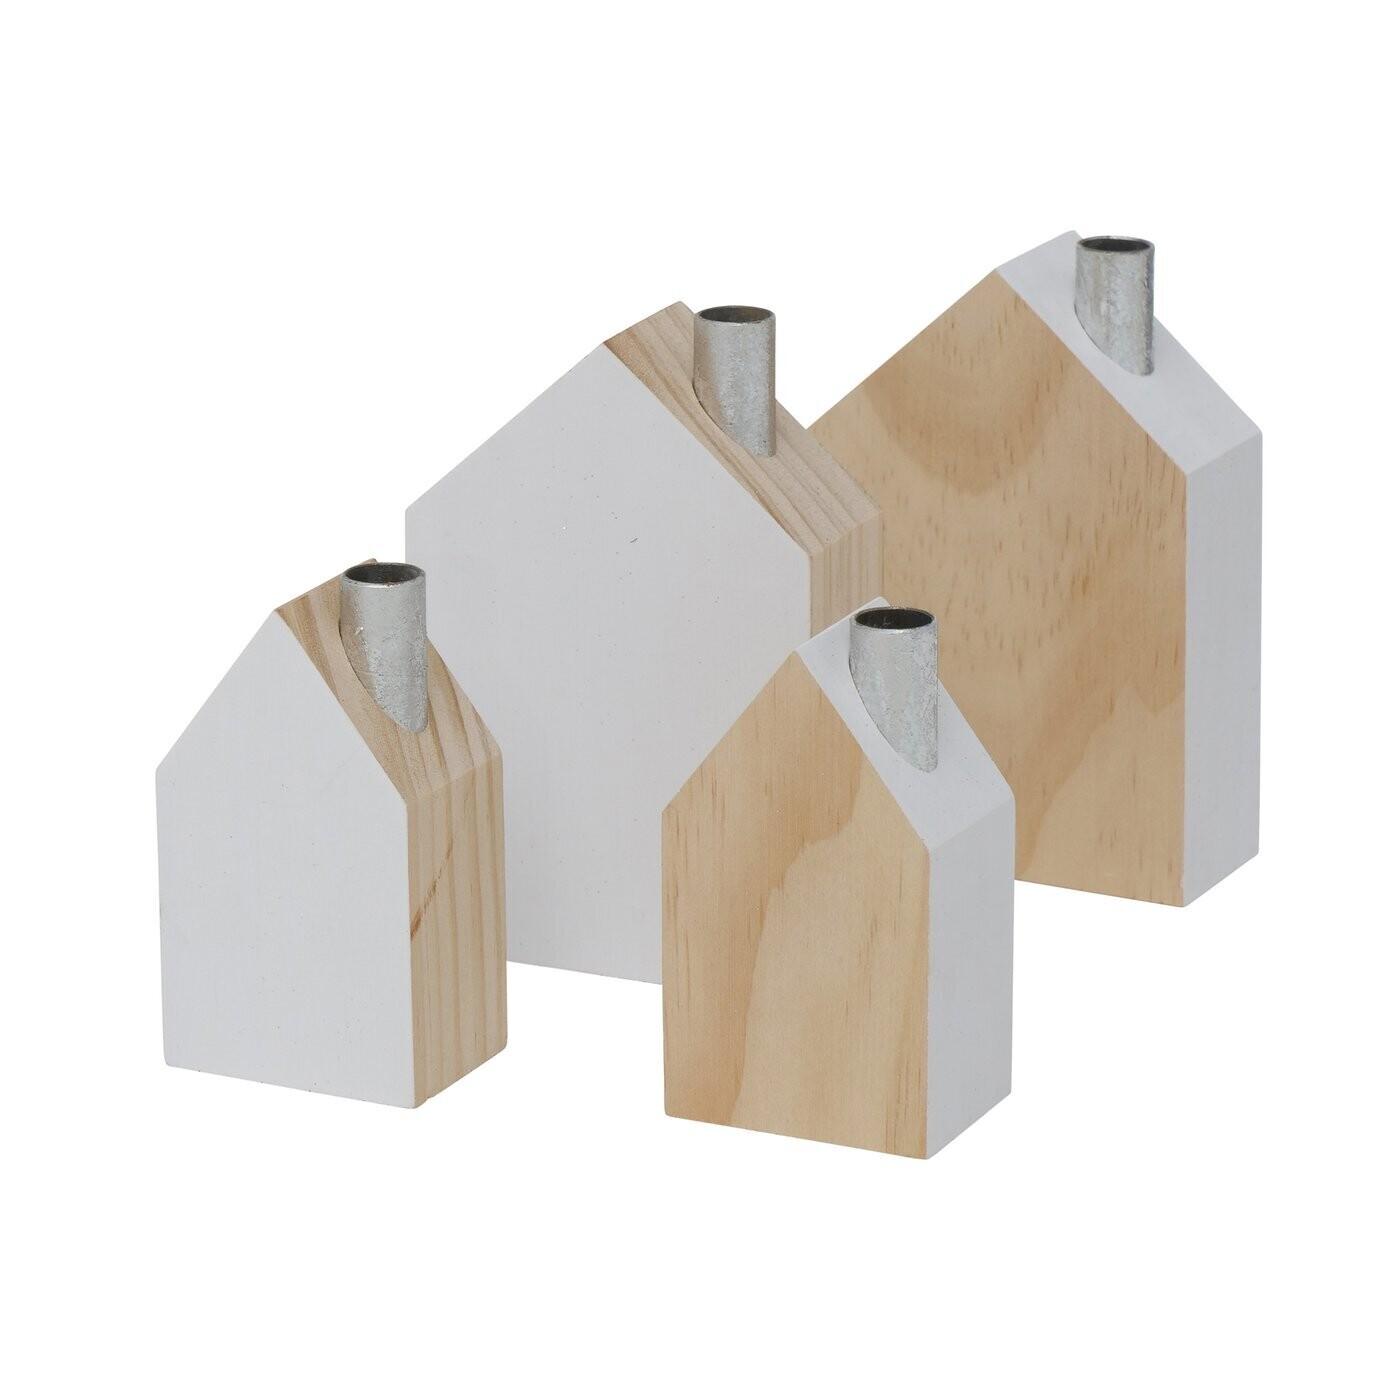 Haus, Holz, h 9 + 12 cm - Set - 2 Stück